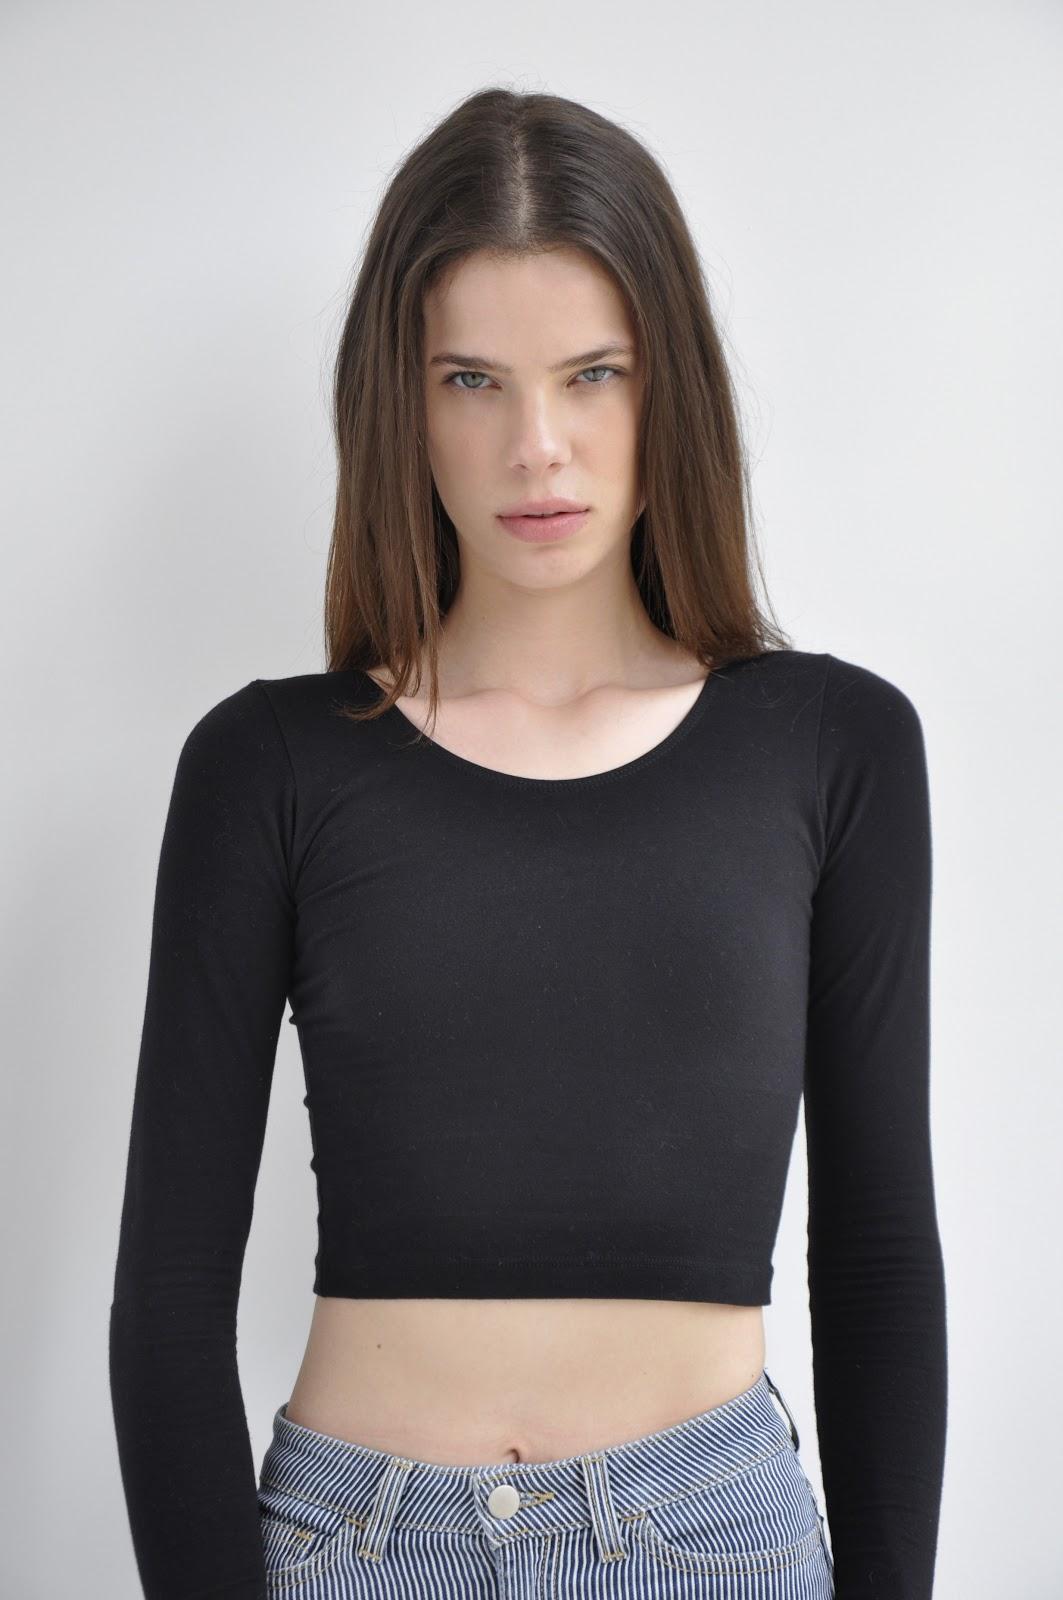 Jessi Model Elite Model Management Toronto Jessi Updates